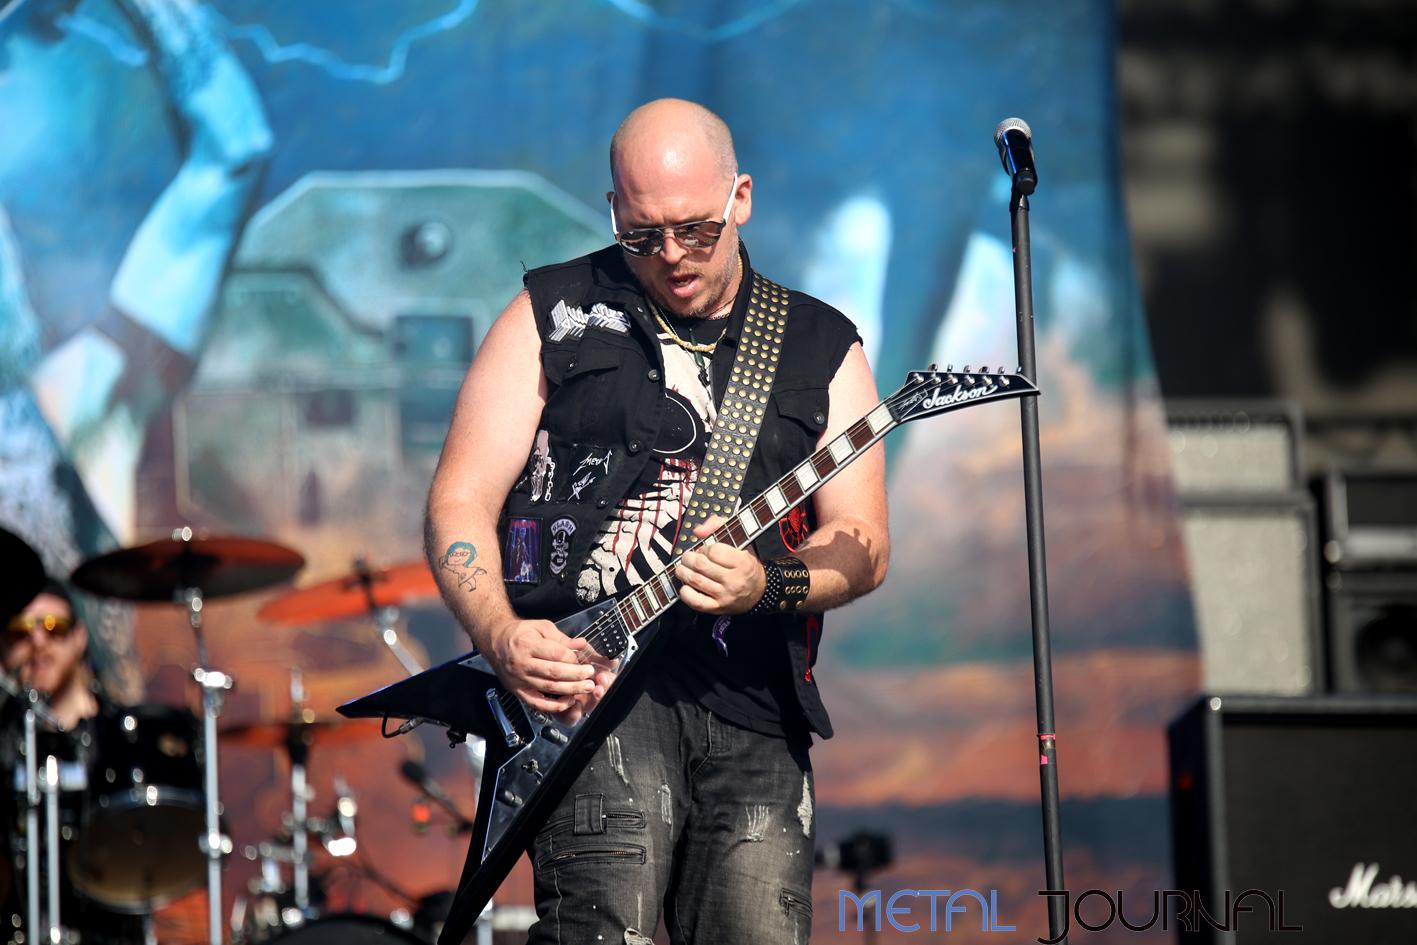 dee snider rock fest 18 - metal journal pic 7